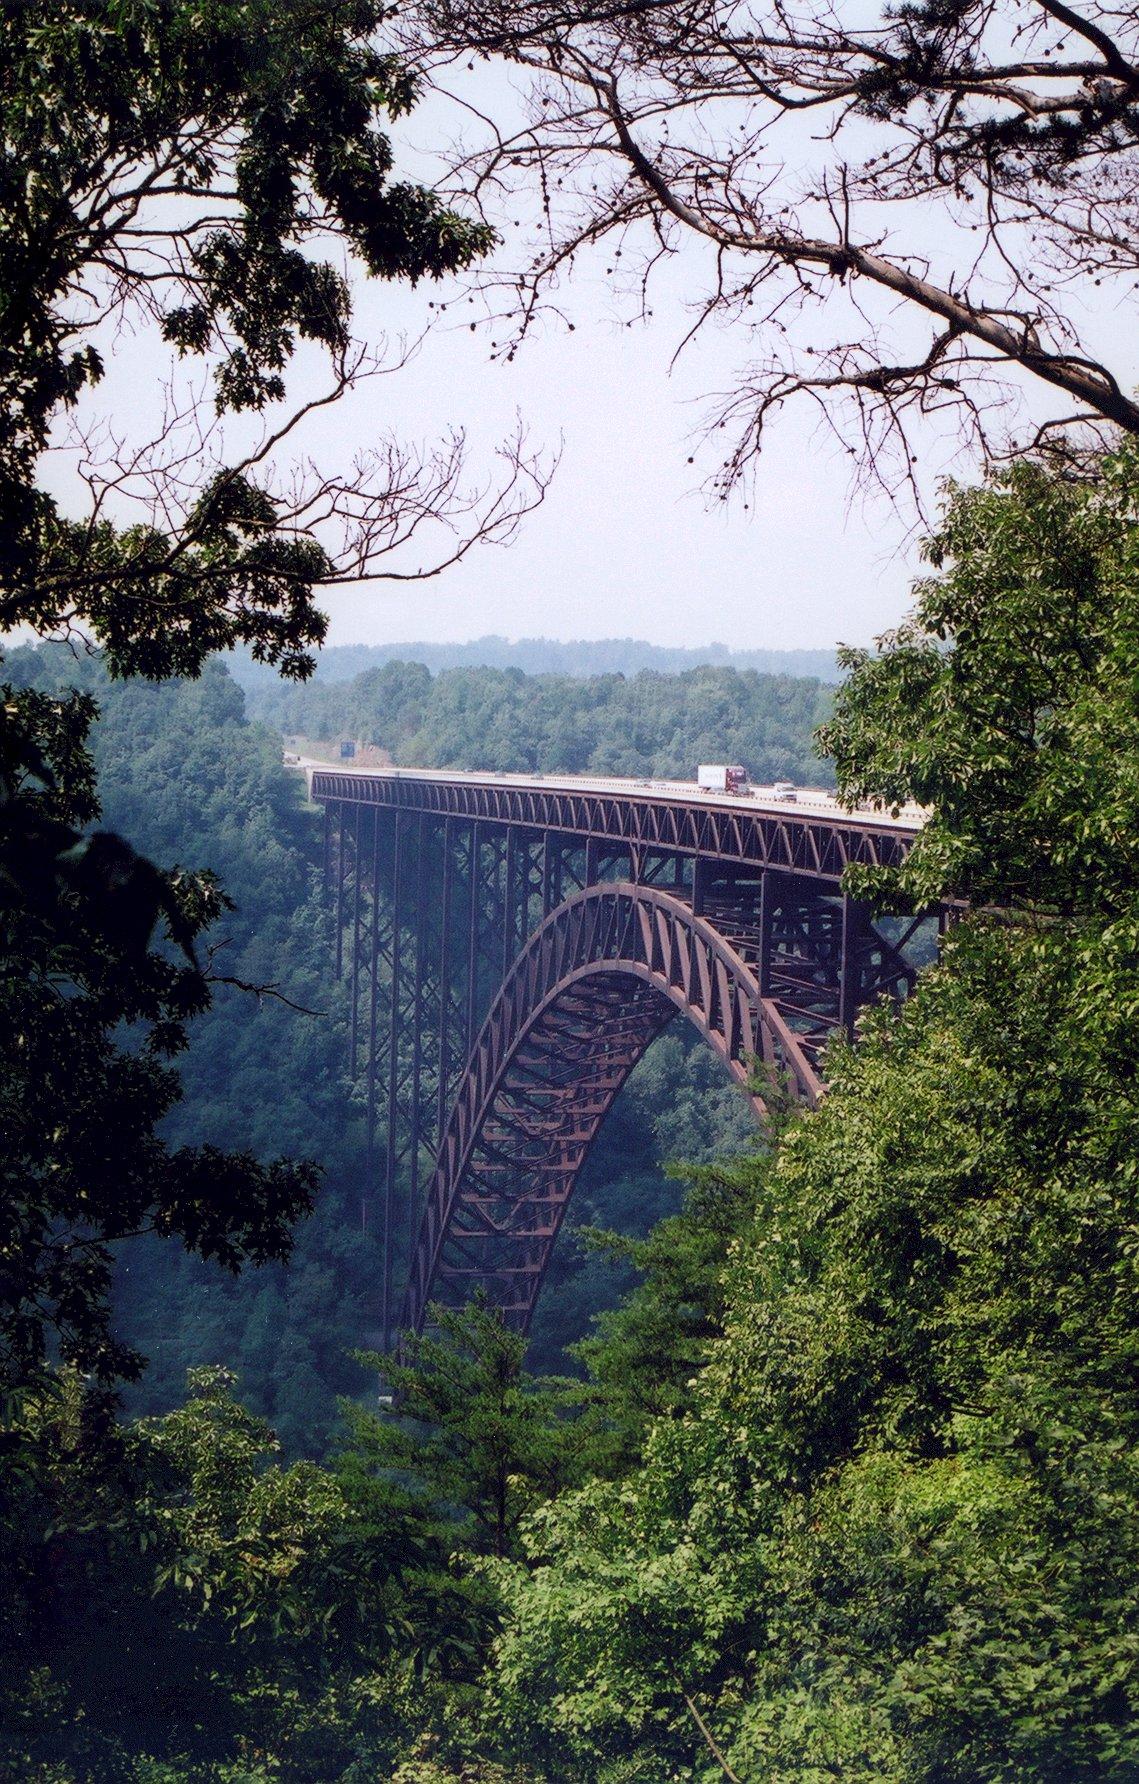 The New River Gorge Bridge.